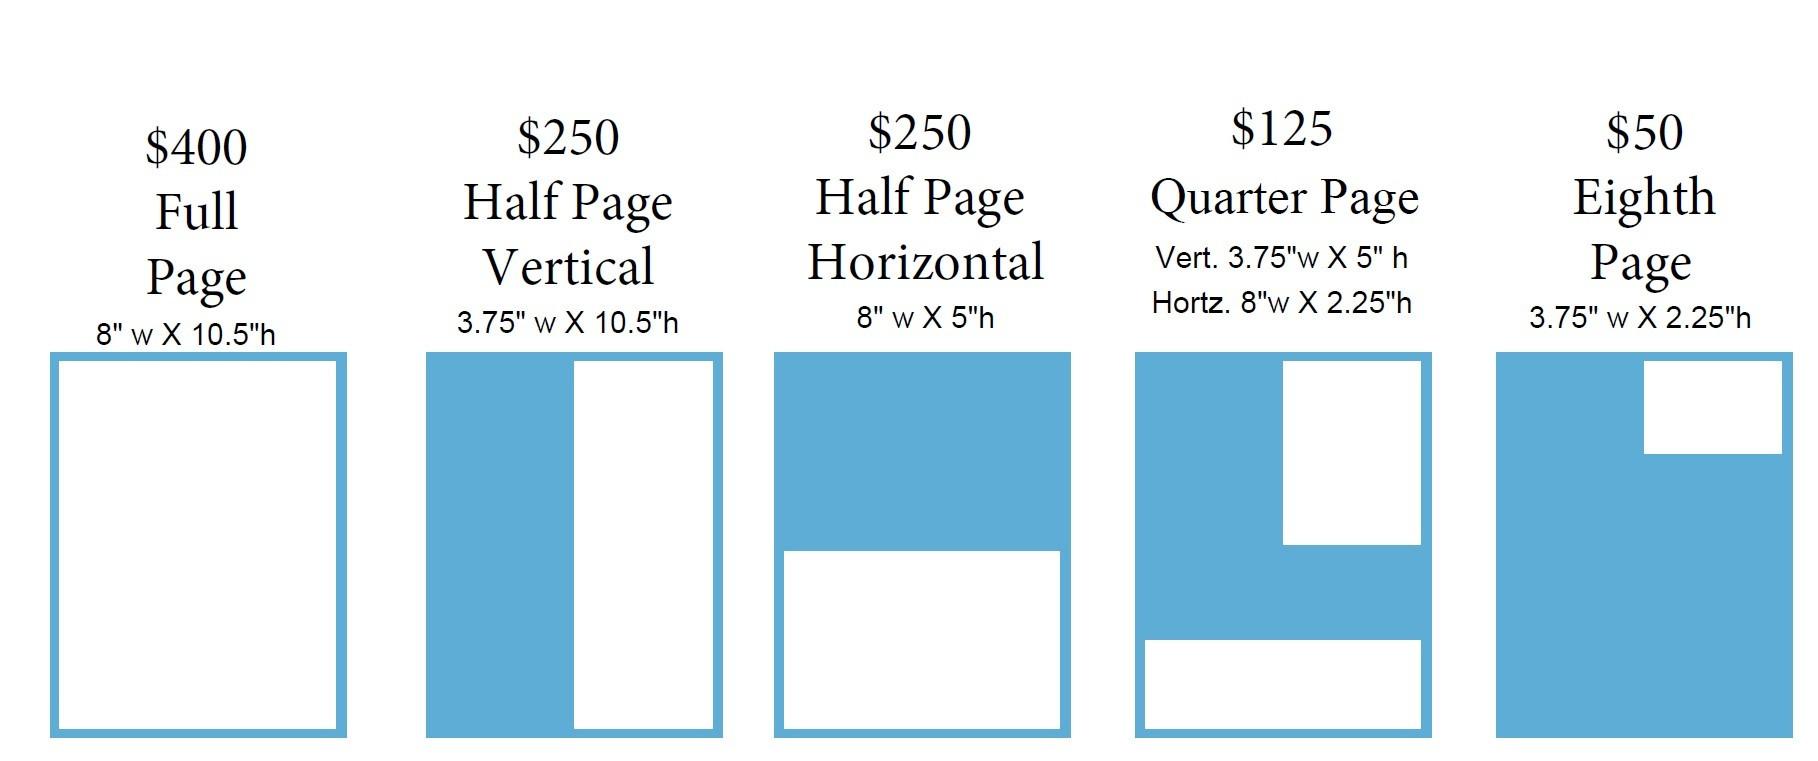 2018-ad-rates-3.jpg